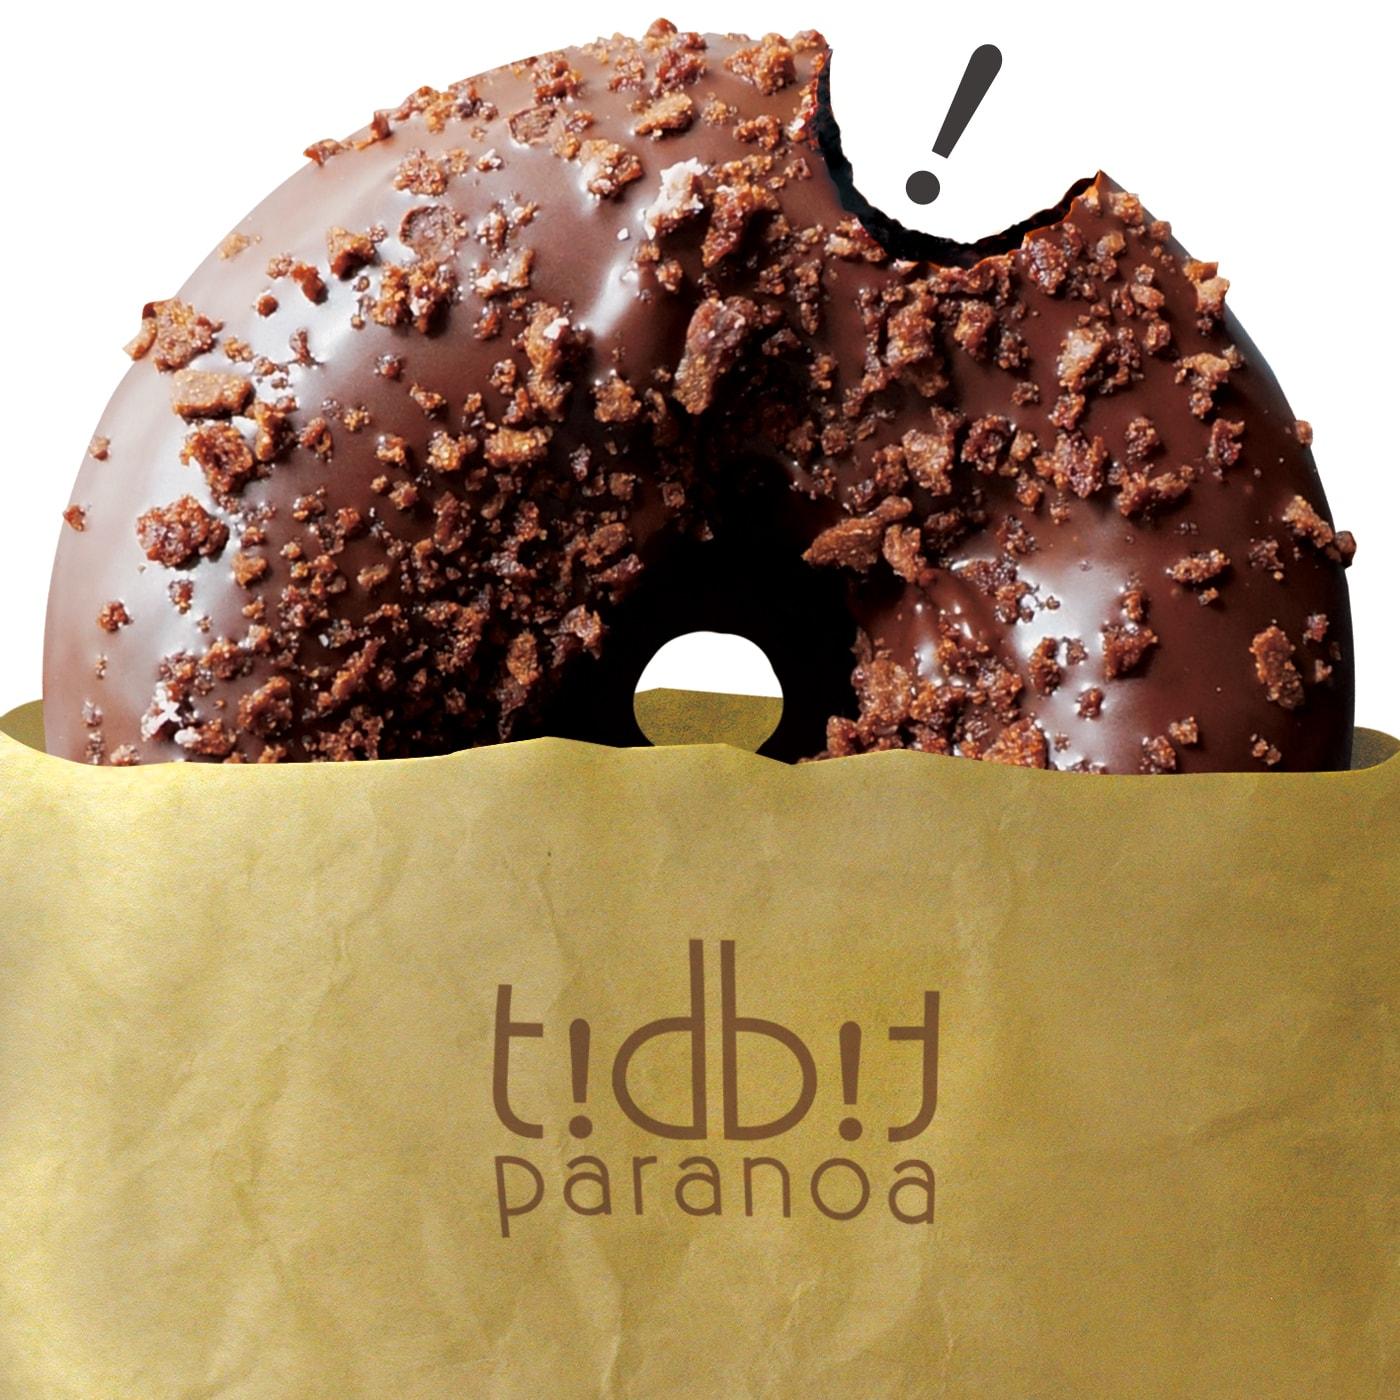 tidbit - 7曲入りのミニアルバム